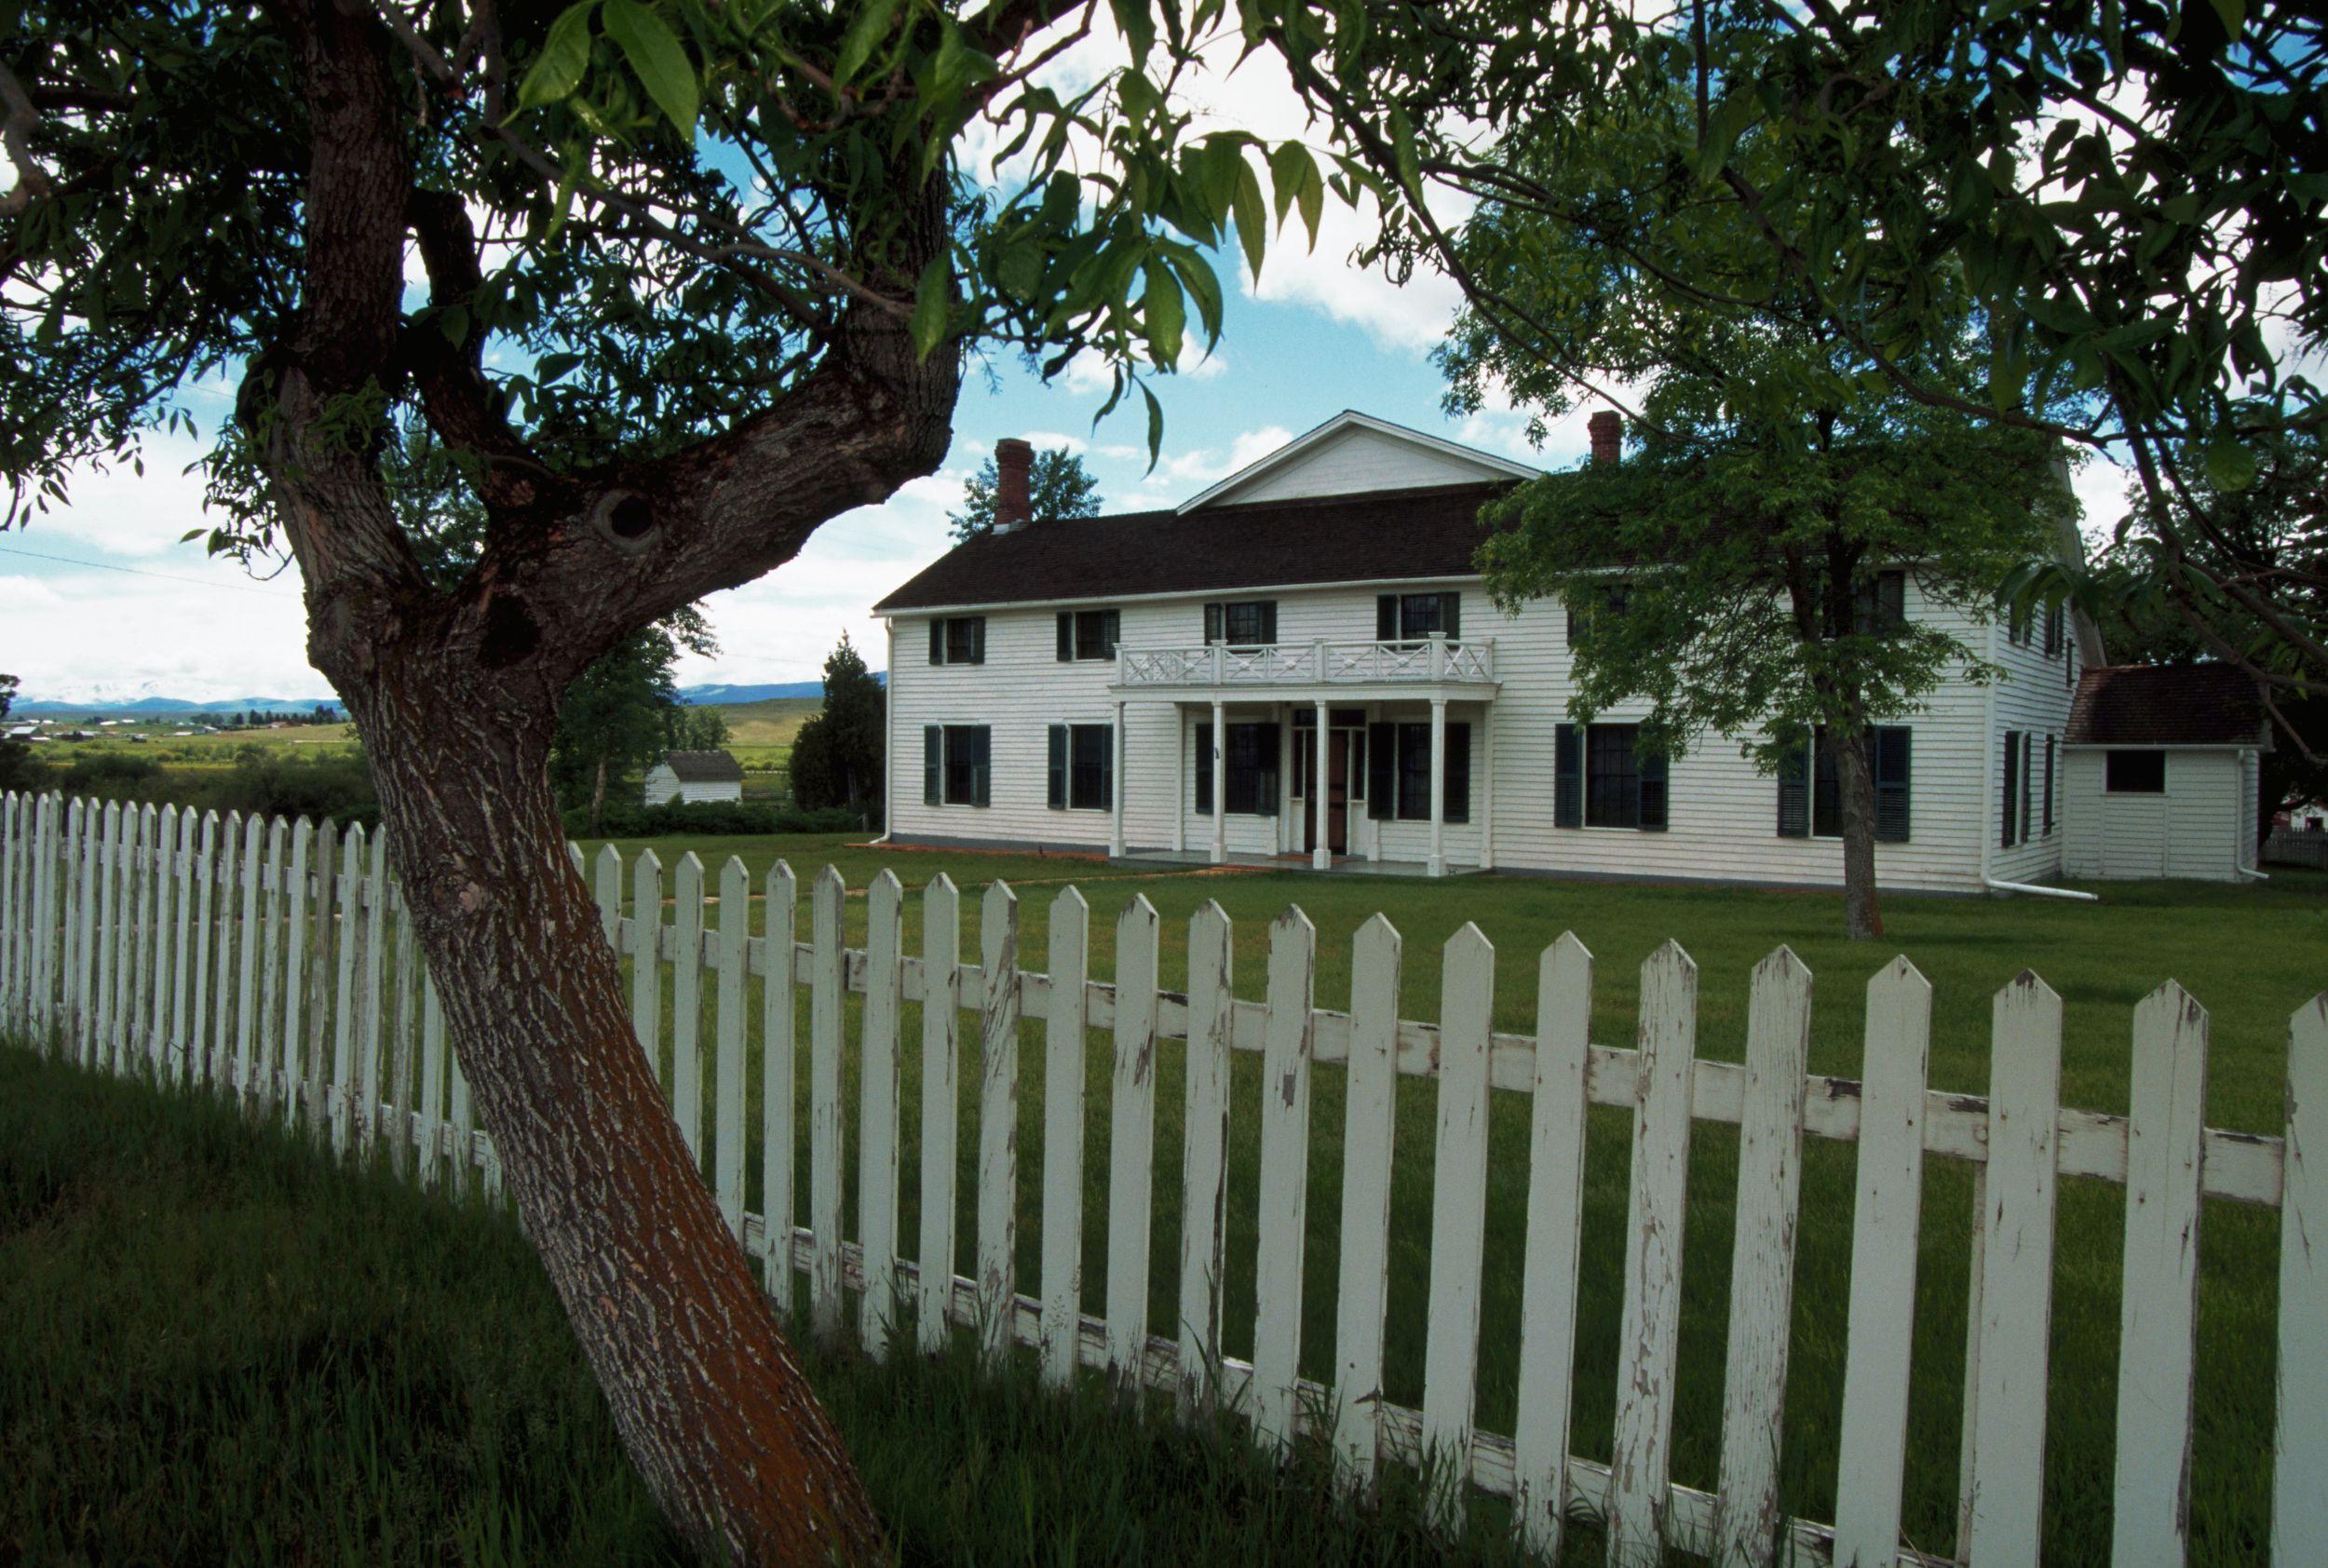 Grant-Kohrs Ranch National Historic Site